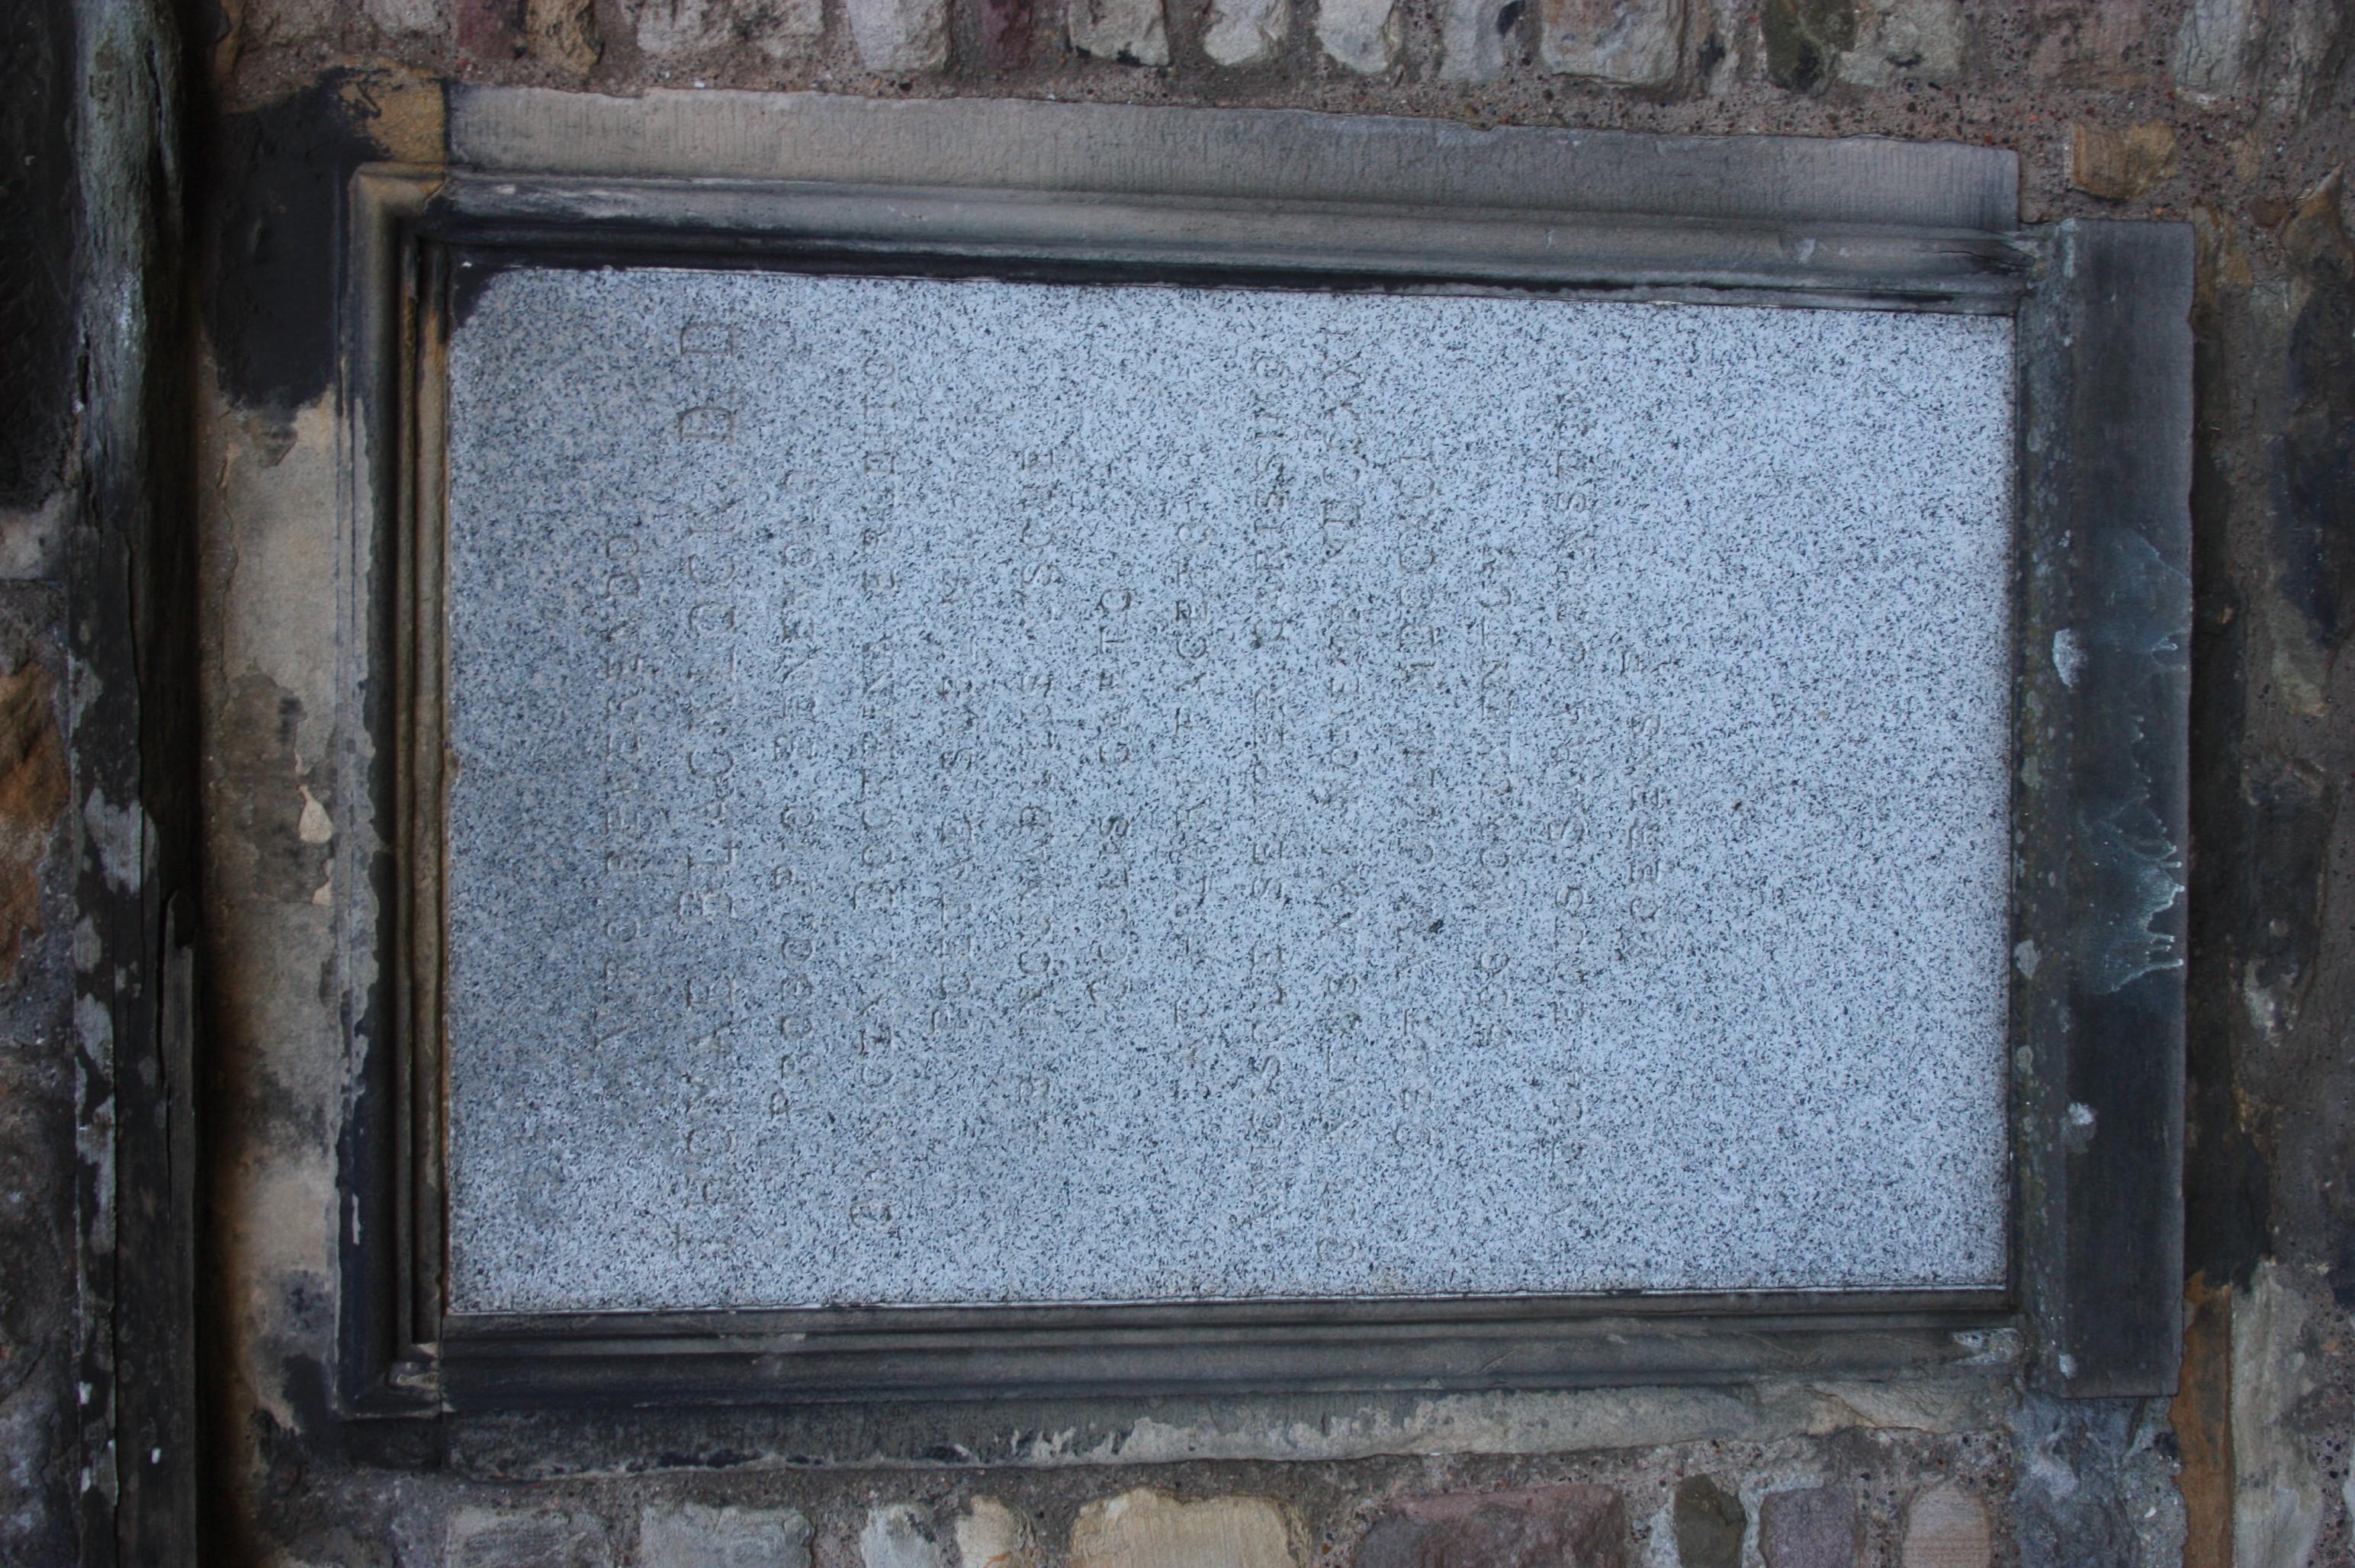 The grave of Rev Thomas Blacklock, Buccleuch Street